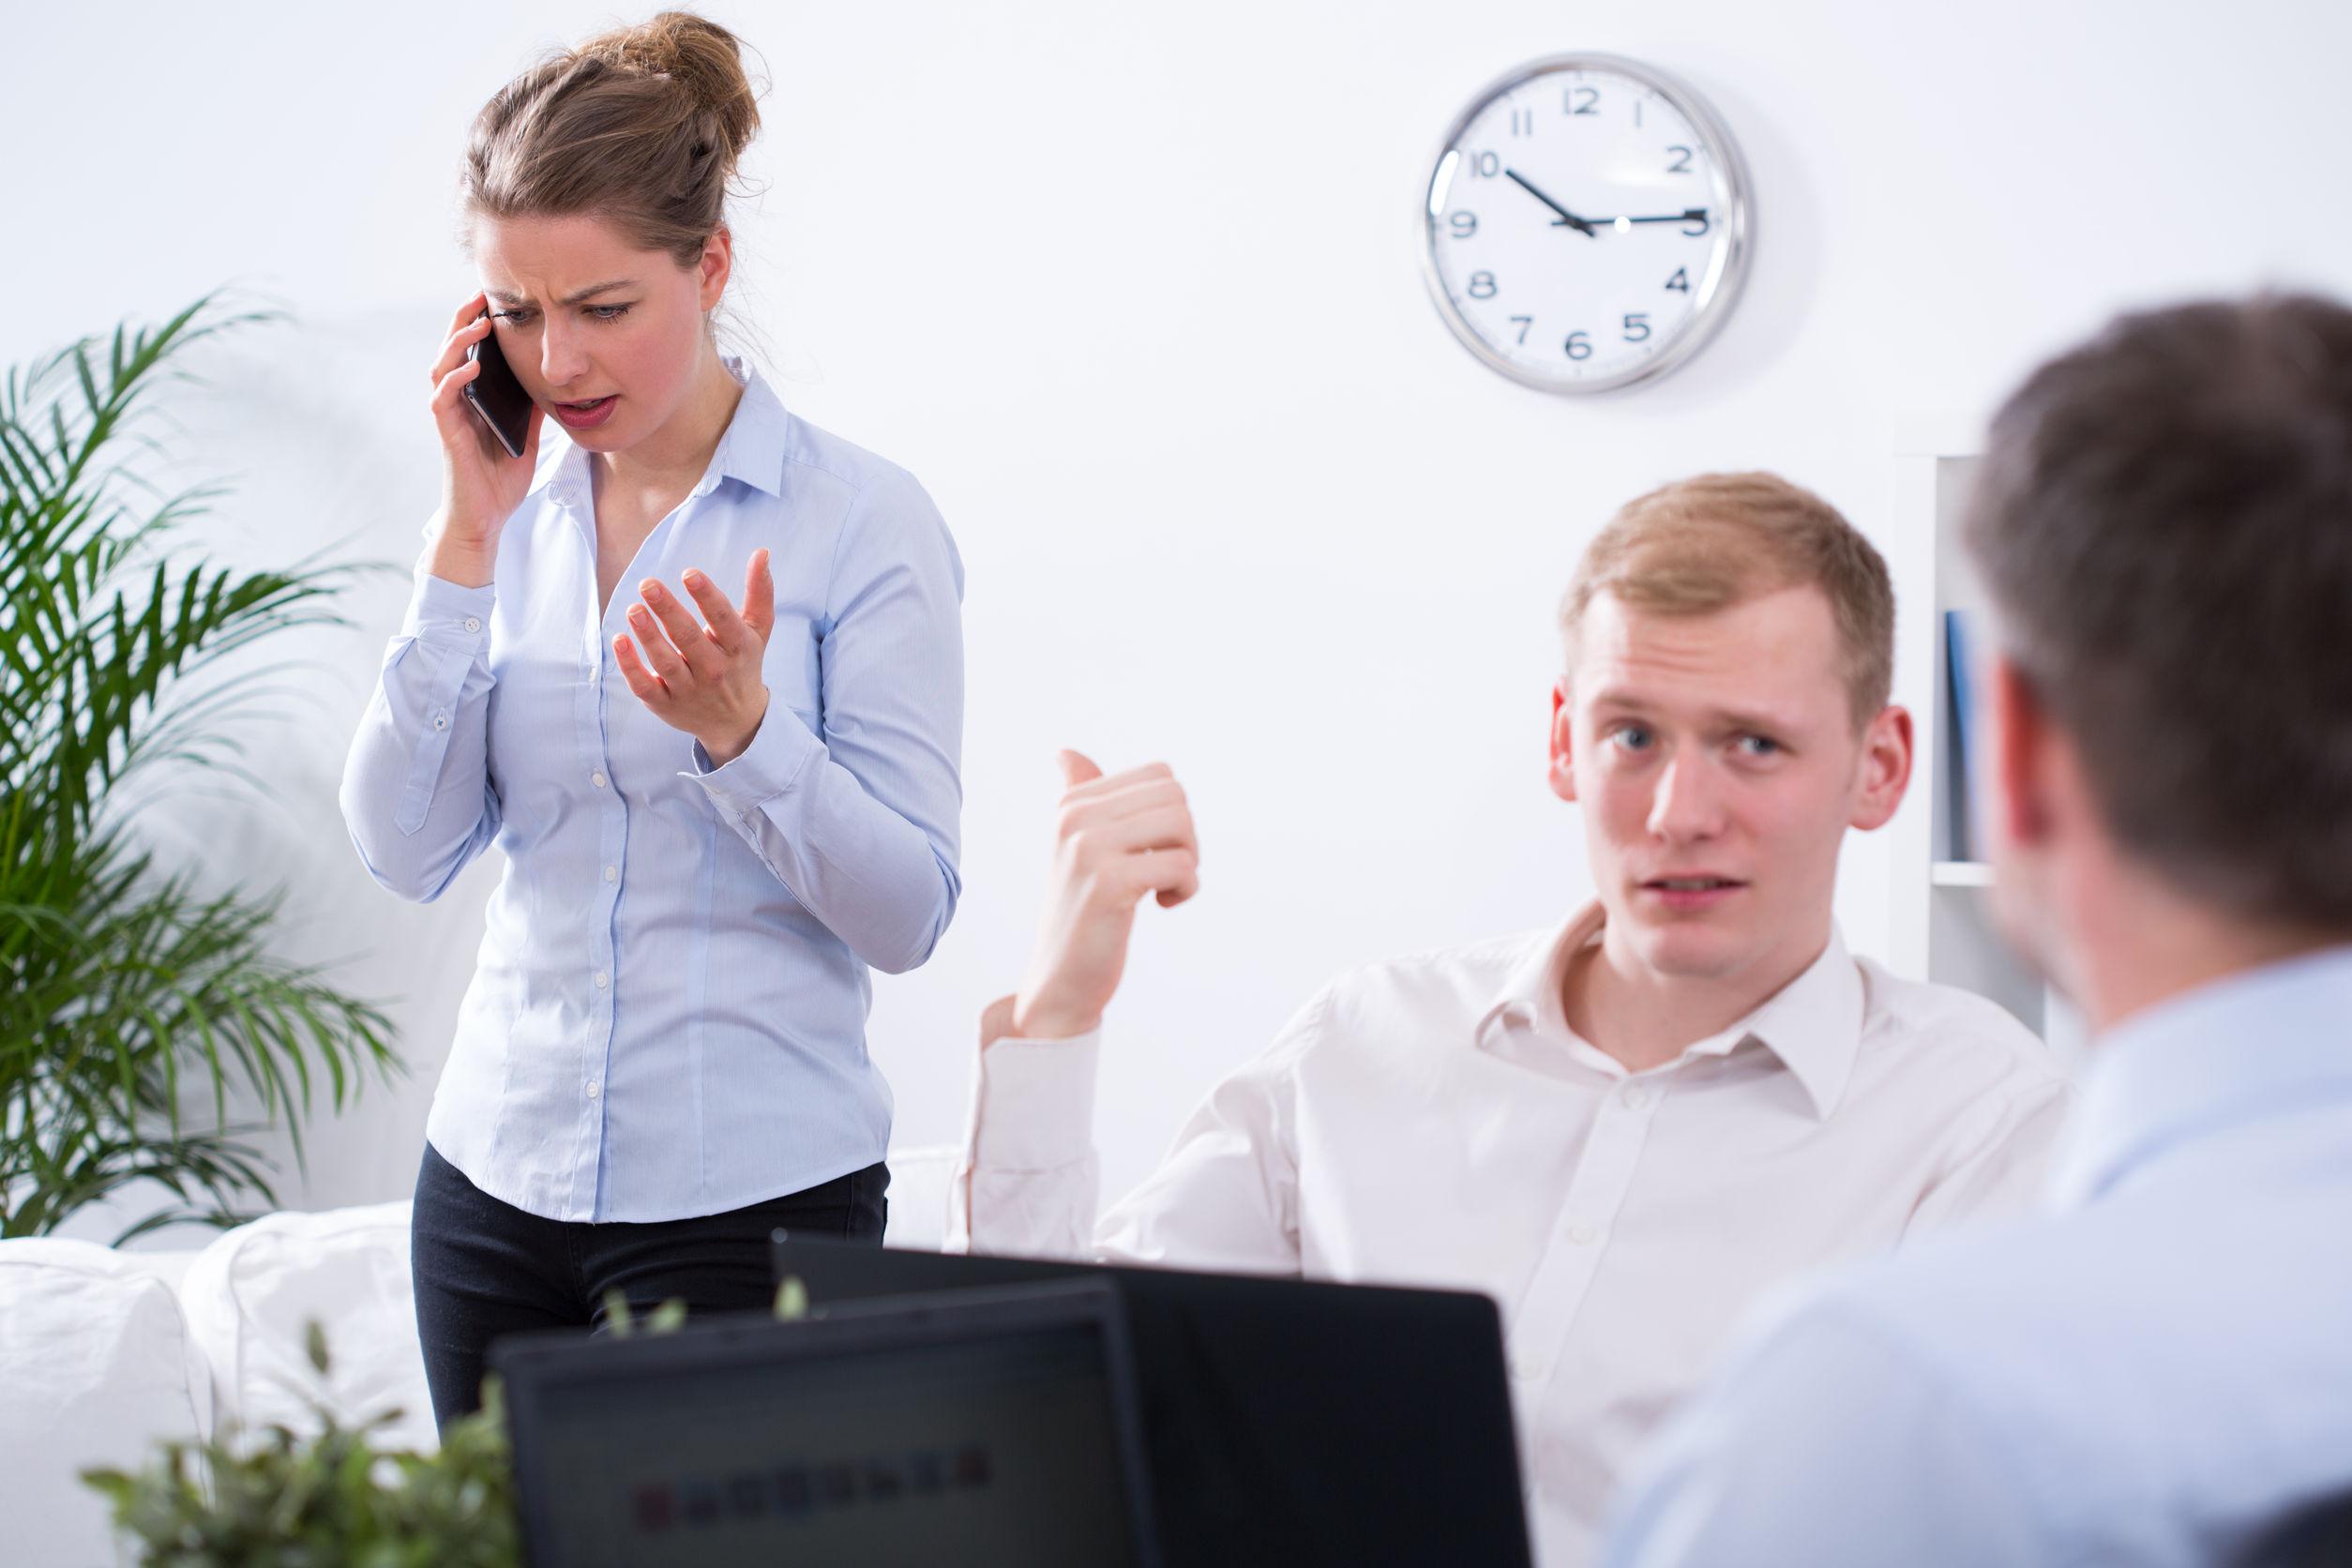 Bad Habits on Jobs